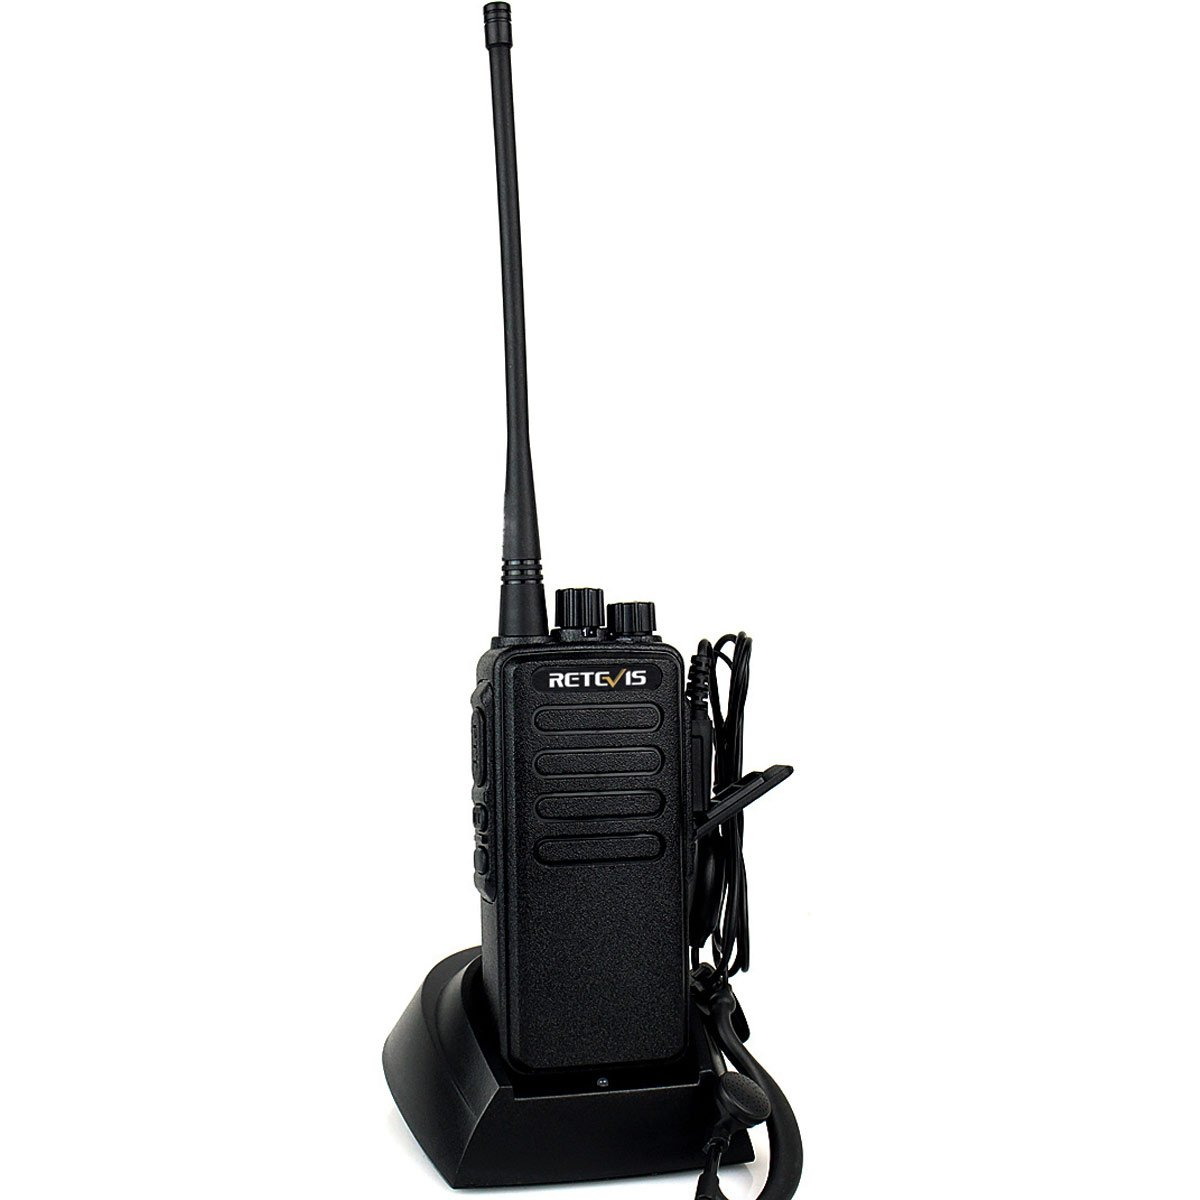 Retevis RT1 10W UHF Two Way Radio 70CM 400-520 MHz 16CH VOX Scrambler Ham radio and Speaker Mic (5 Pack) by Retevis (Image #2)